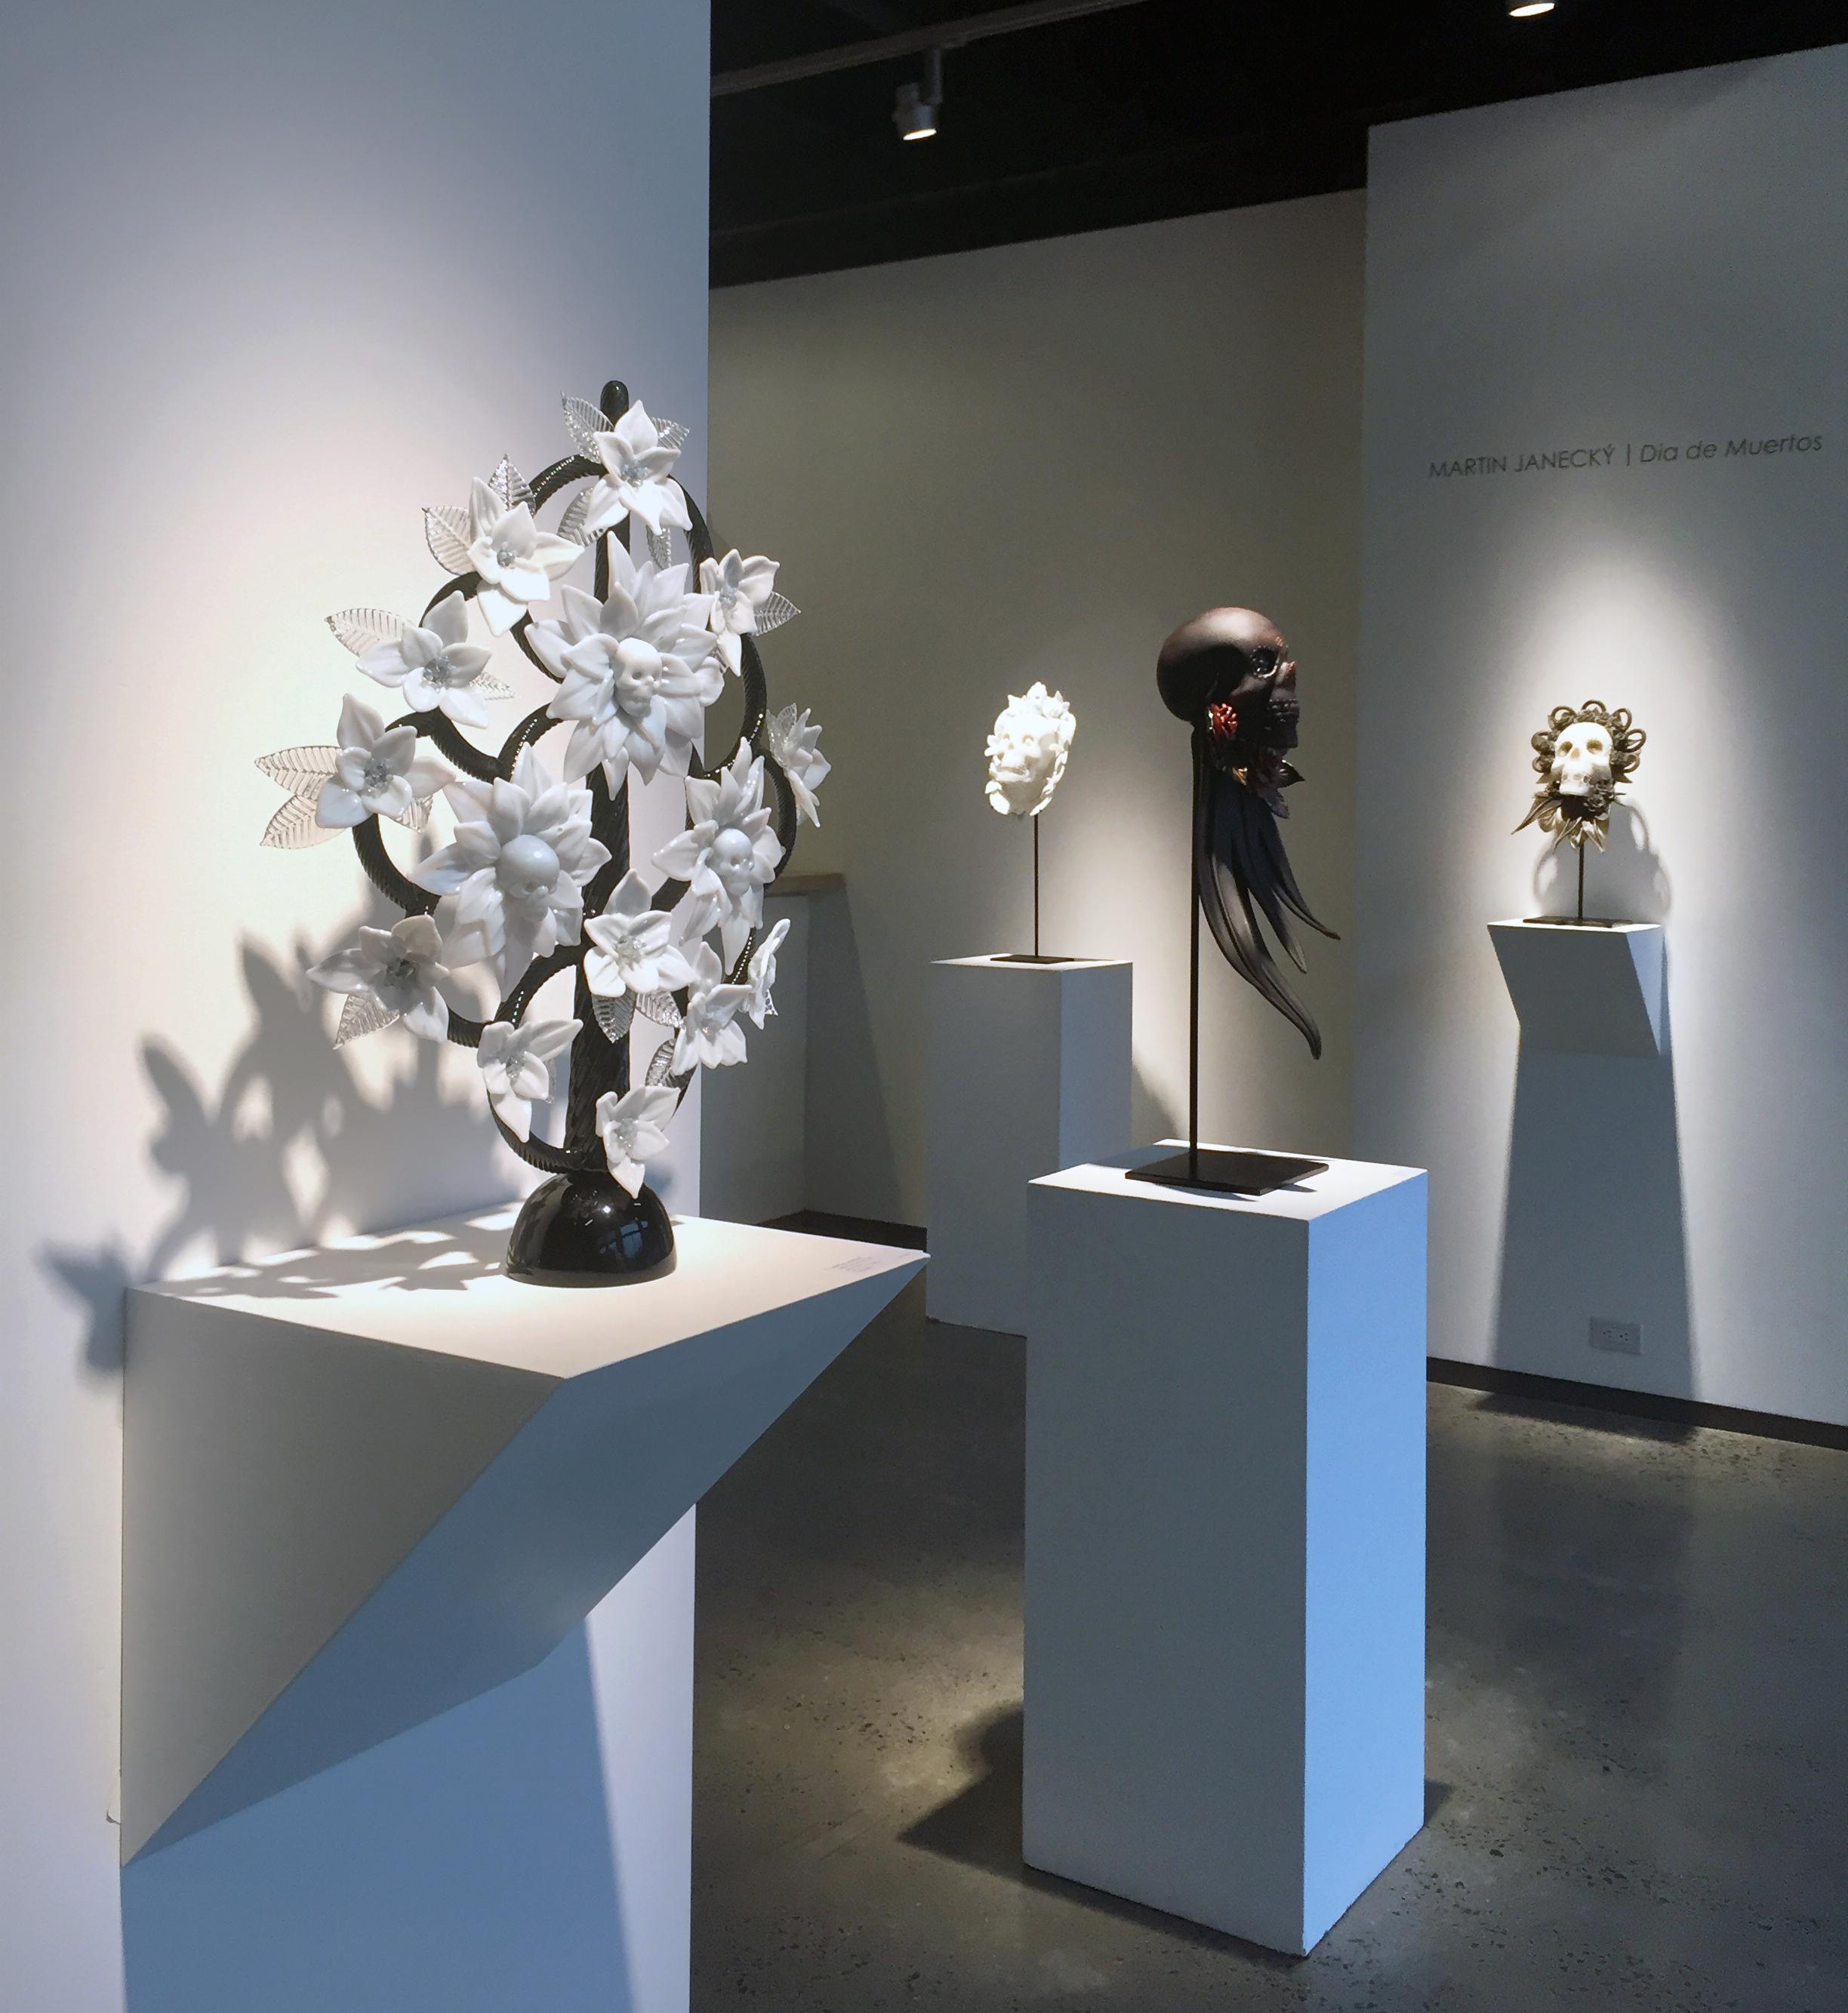 Martin Janecký-installation view 7.jpg